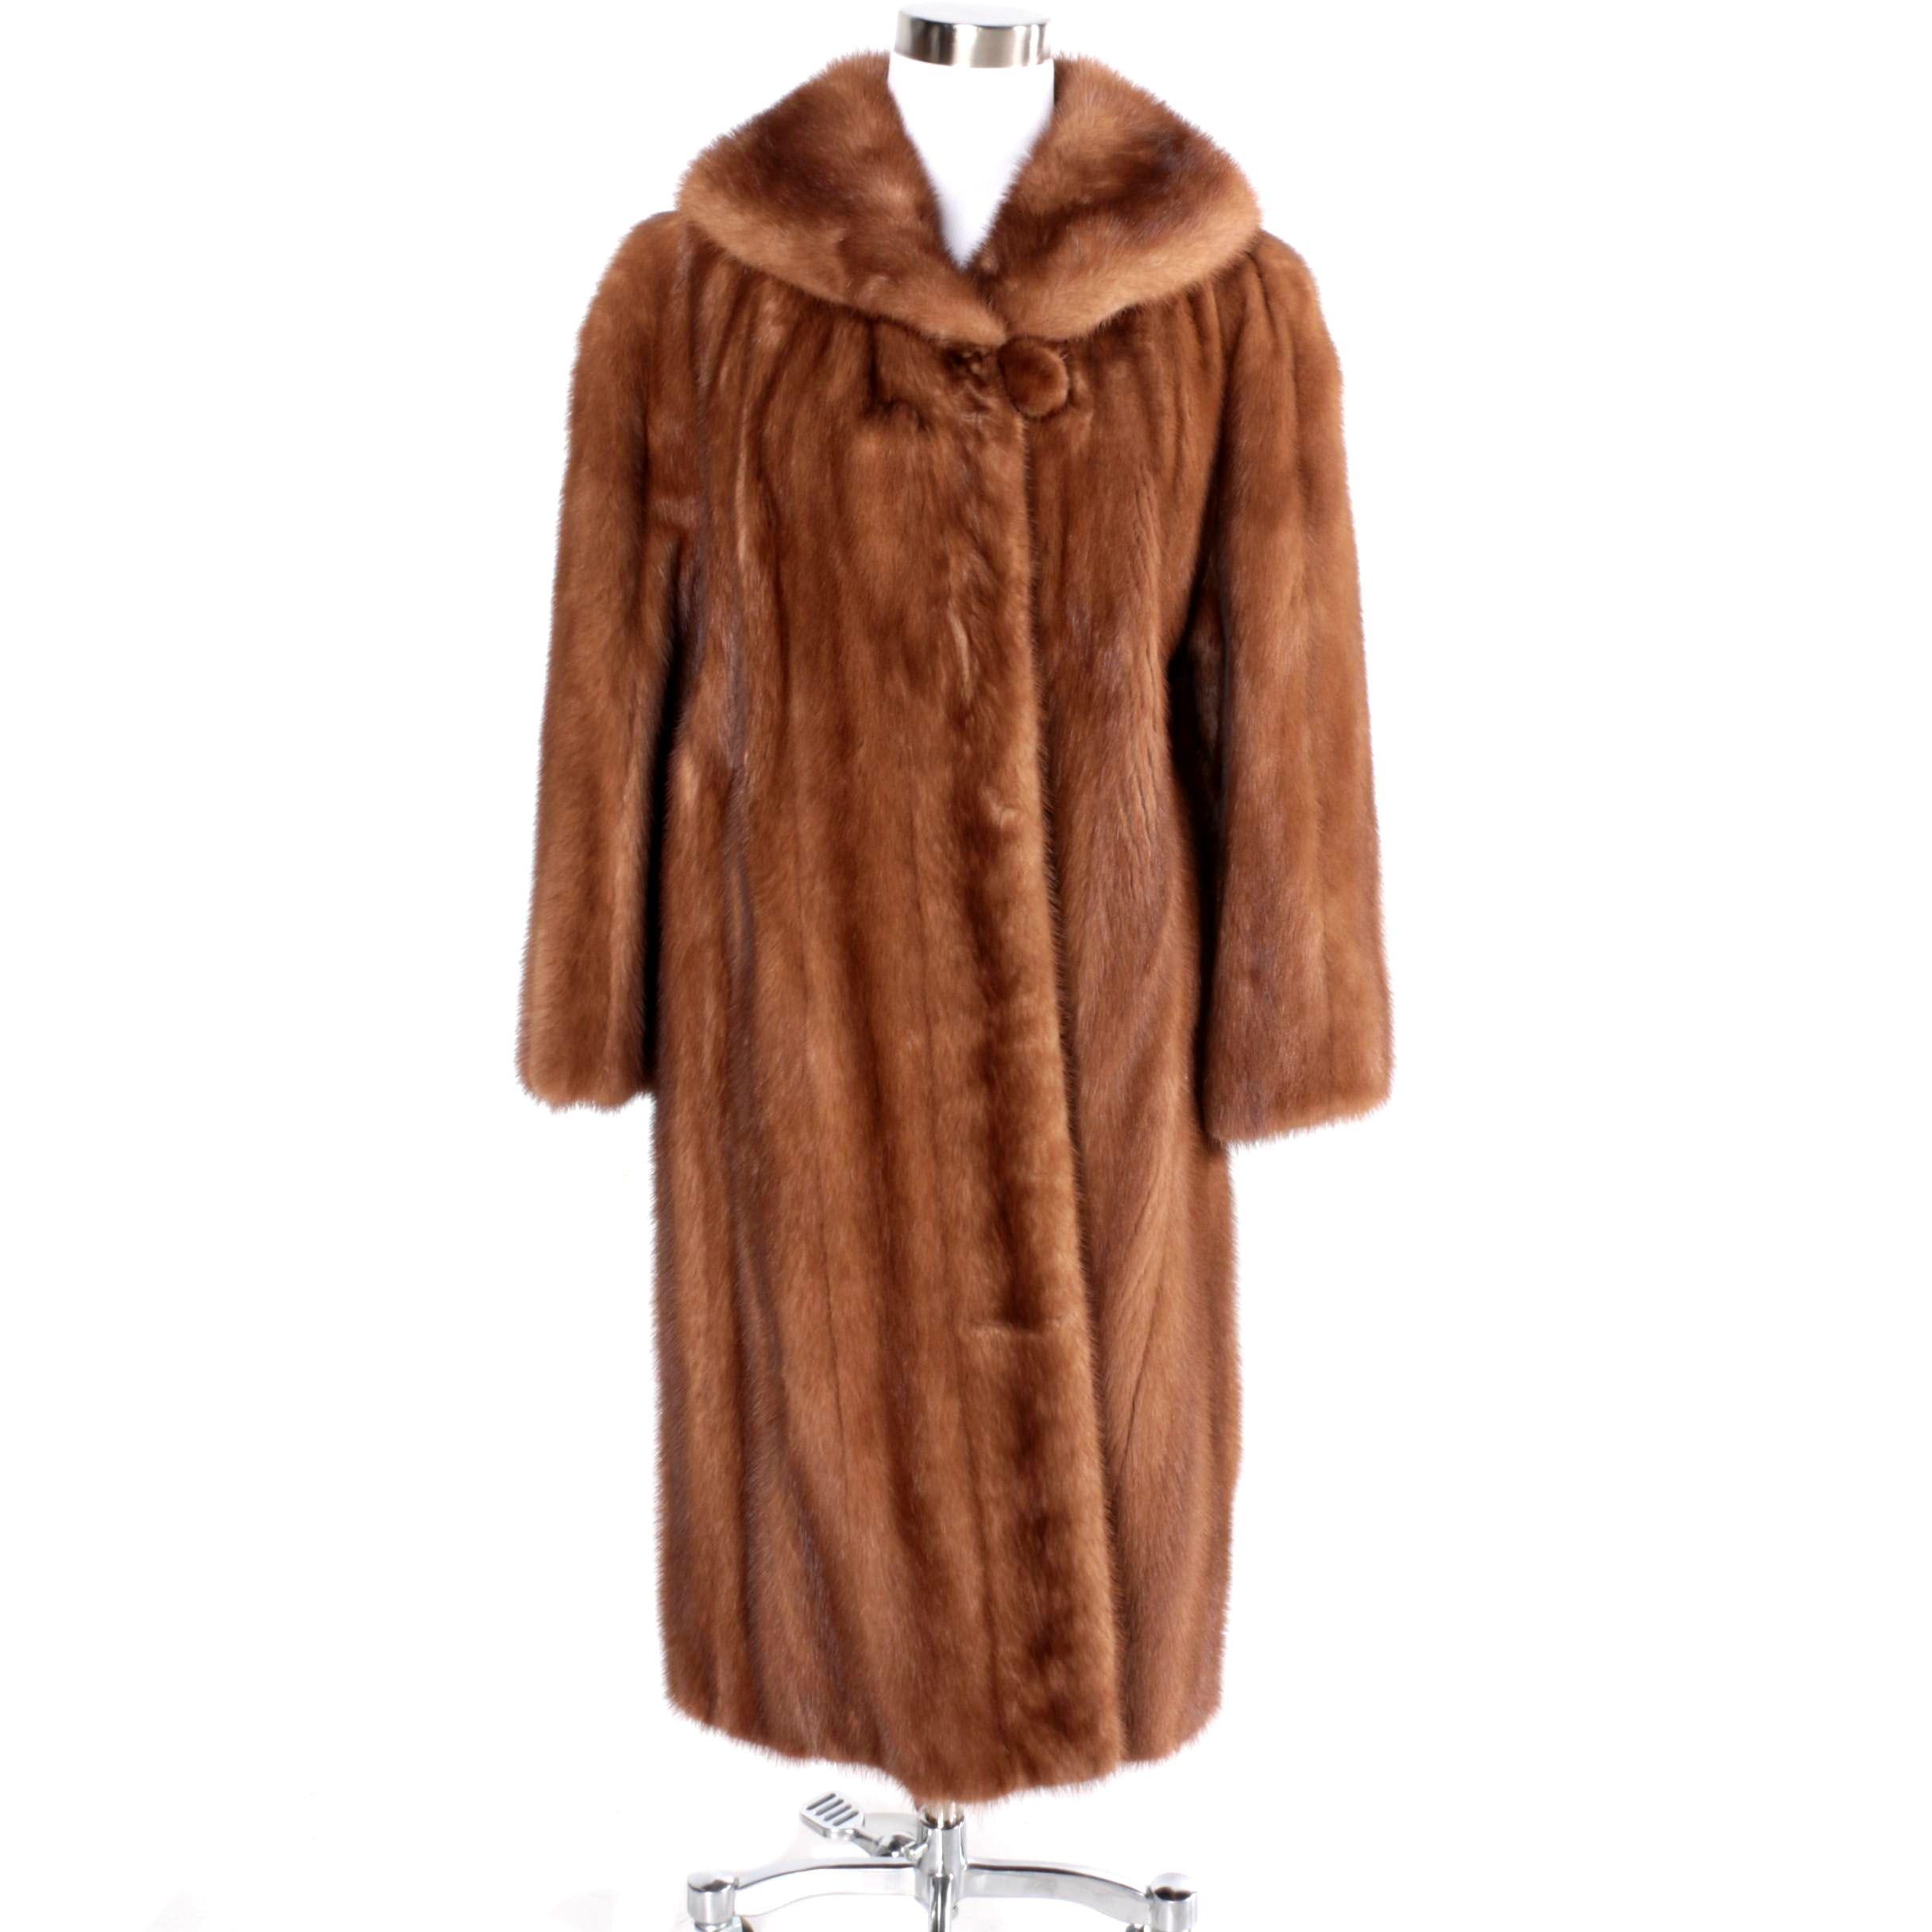 Vintage Emba Pastel Mink Fur Swing Coat from Annis Furs